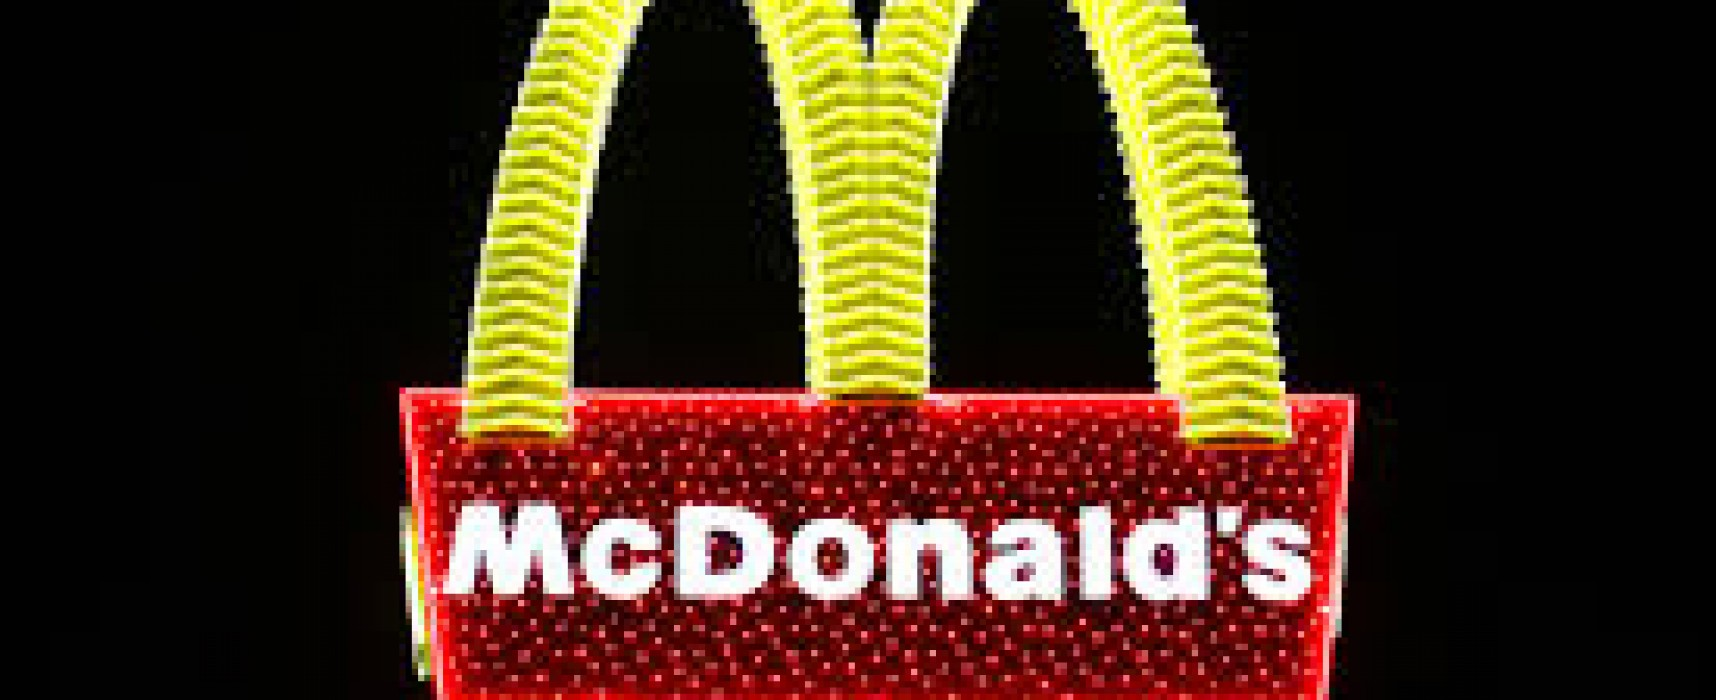 McDonalds – I'm Lovin' It